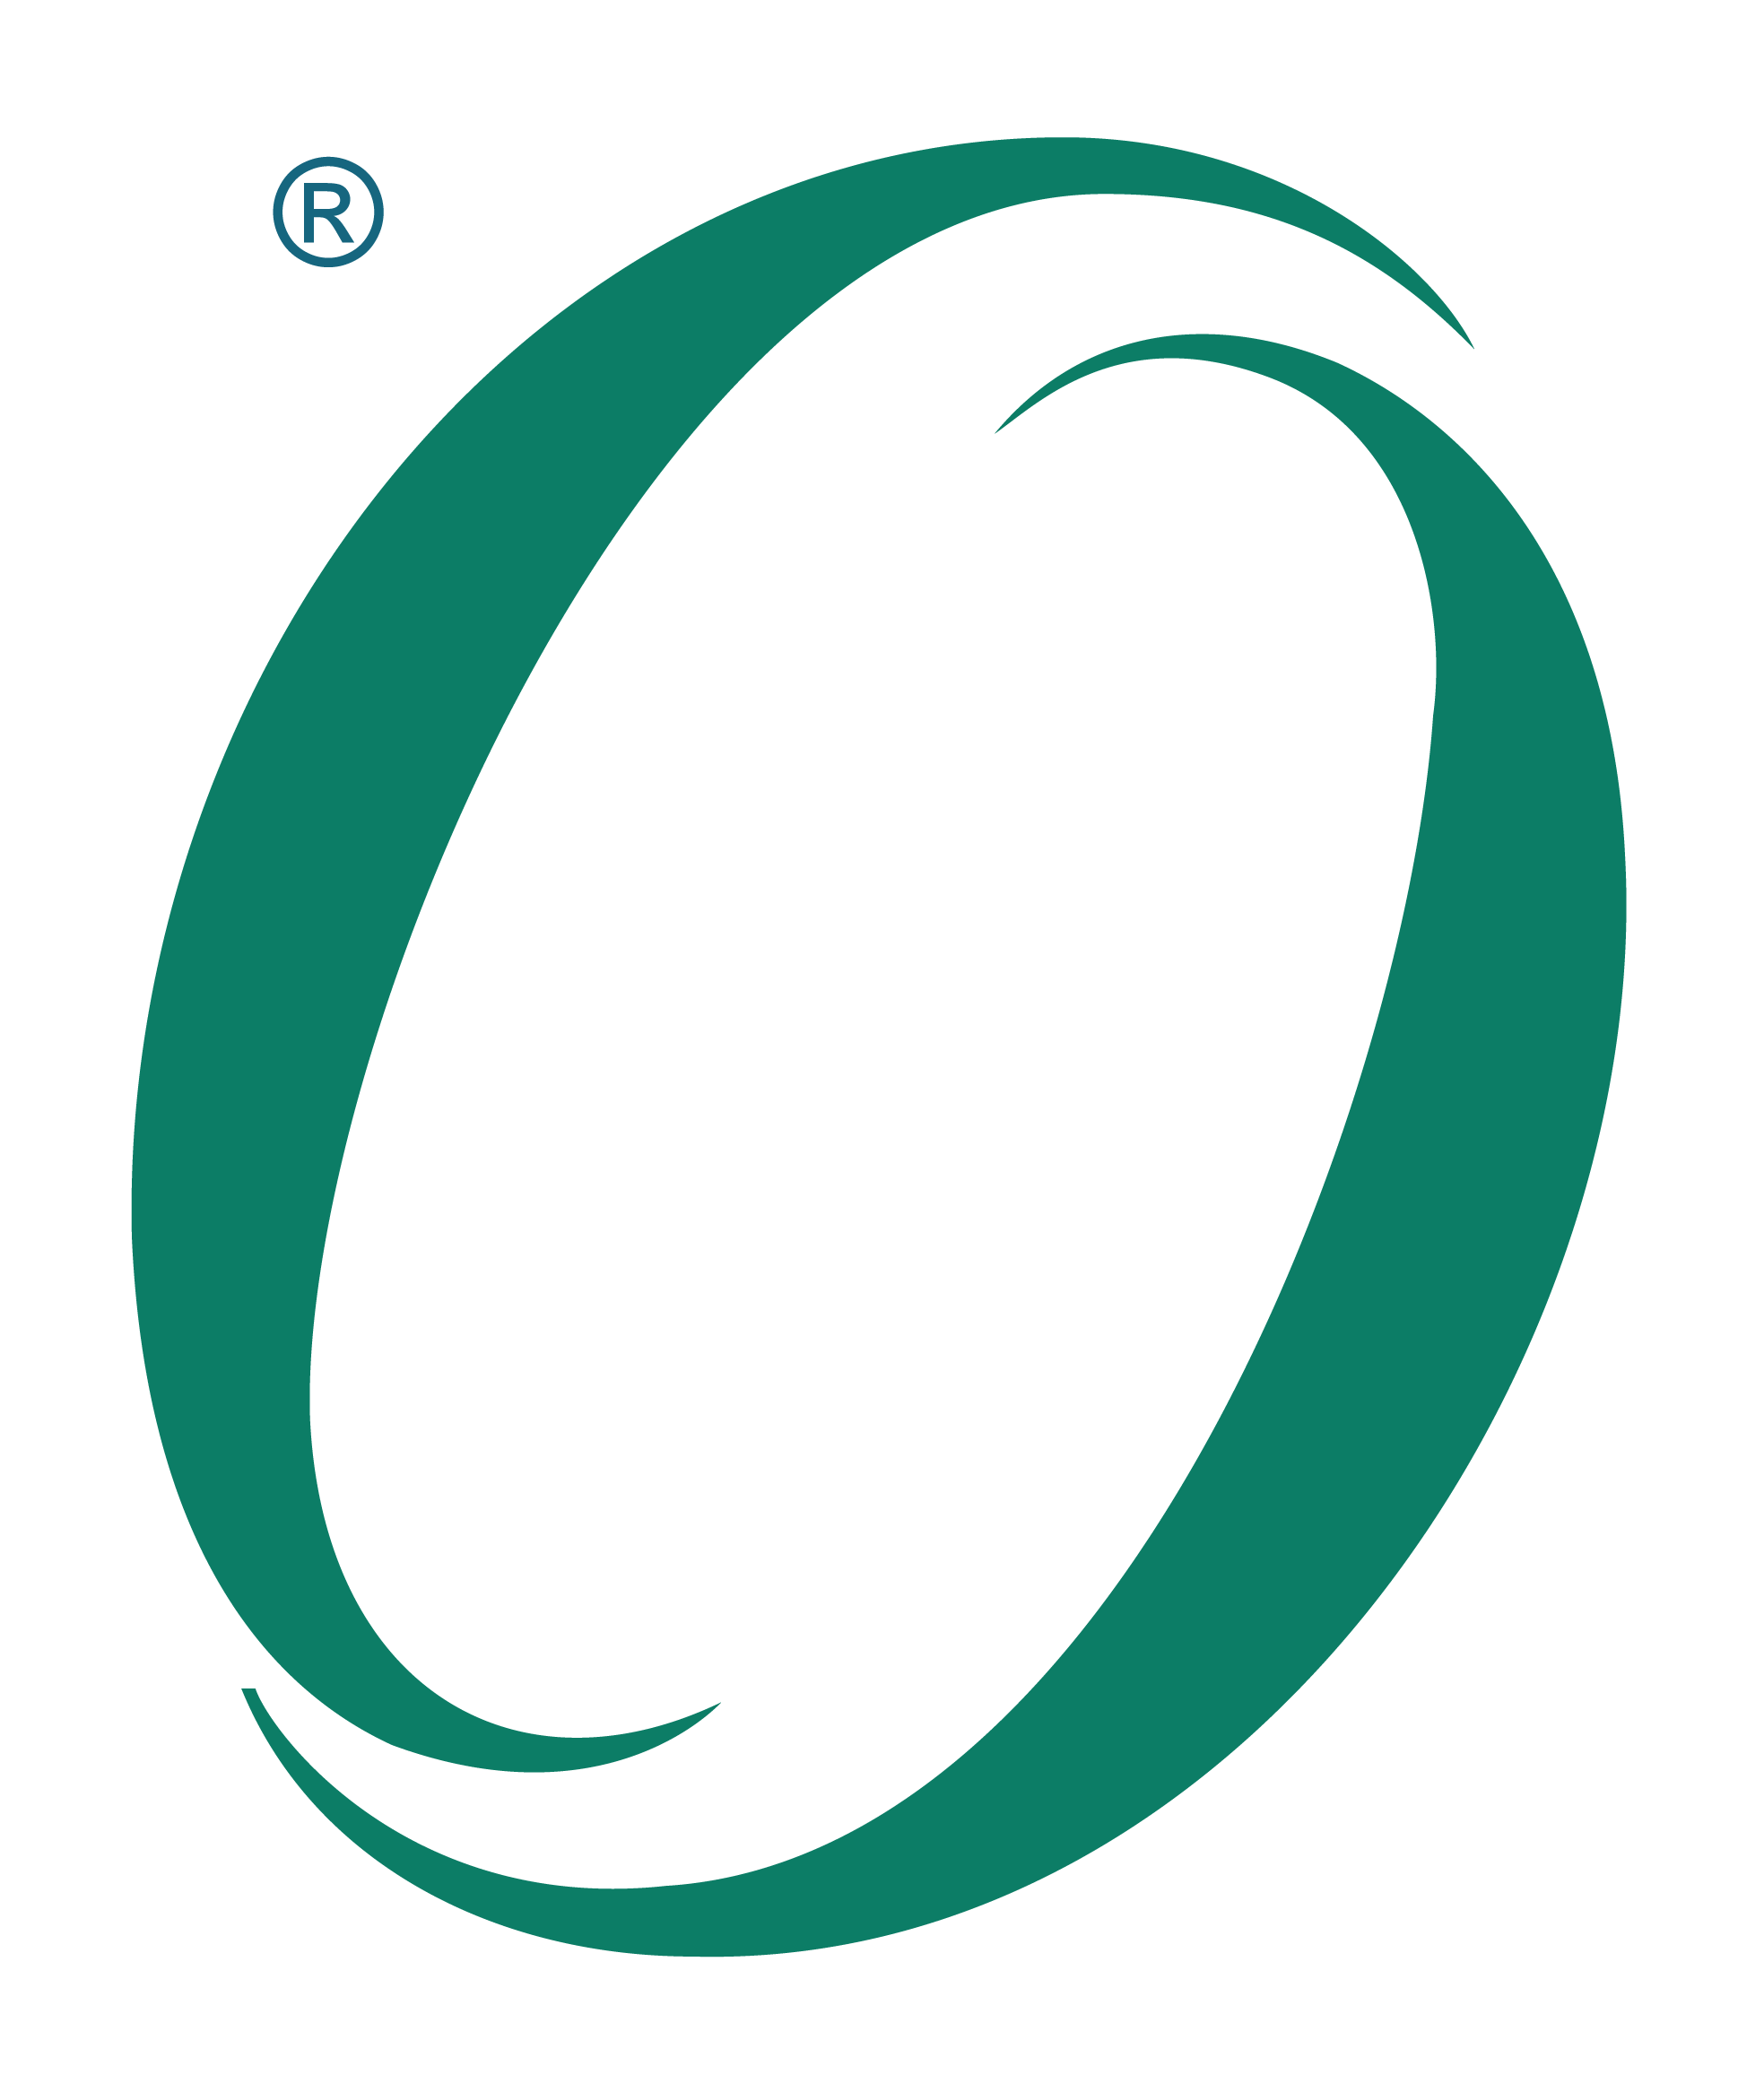 Application Response Measurement (ARM) Issue 3.0 (Java Binding)